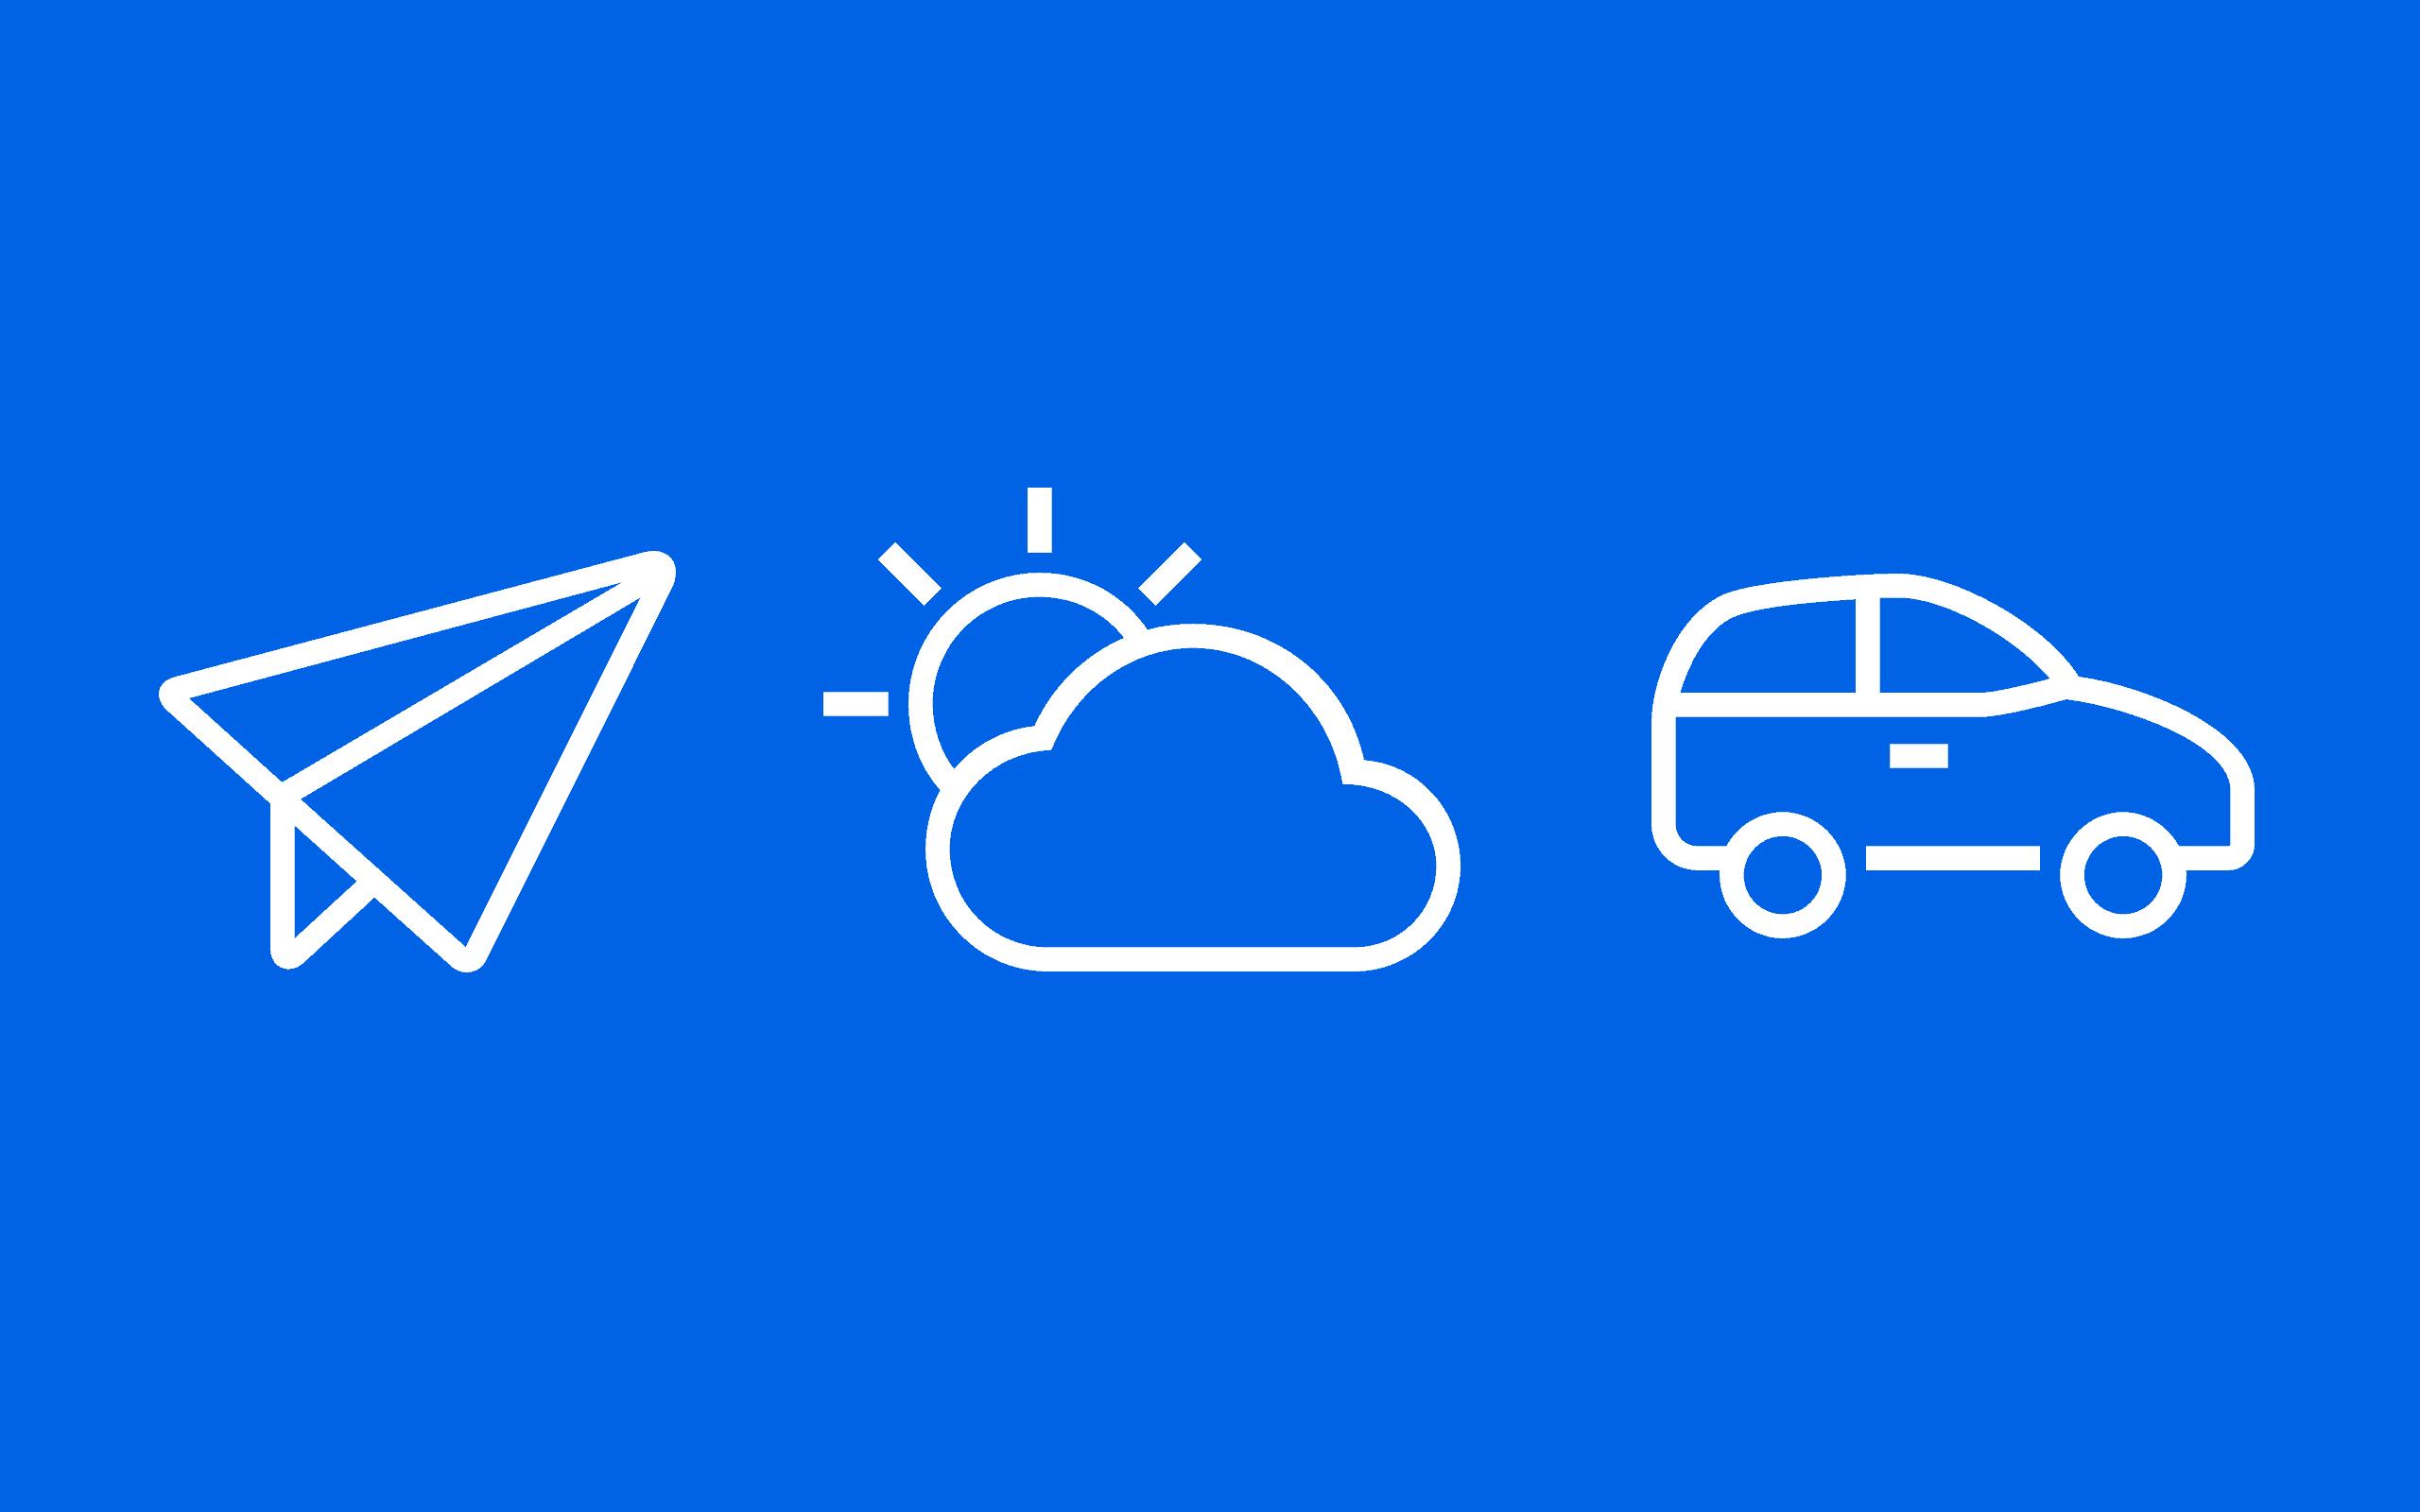 Welt N24 - Icon System